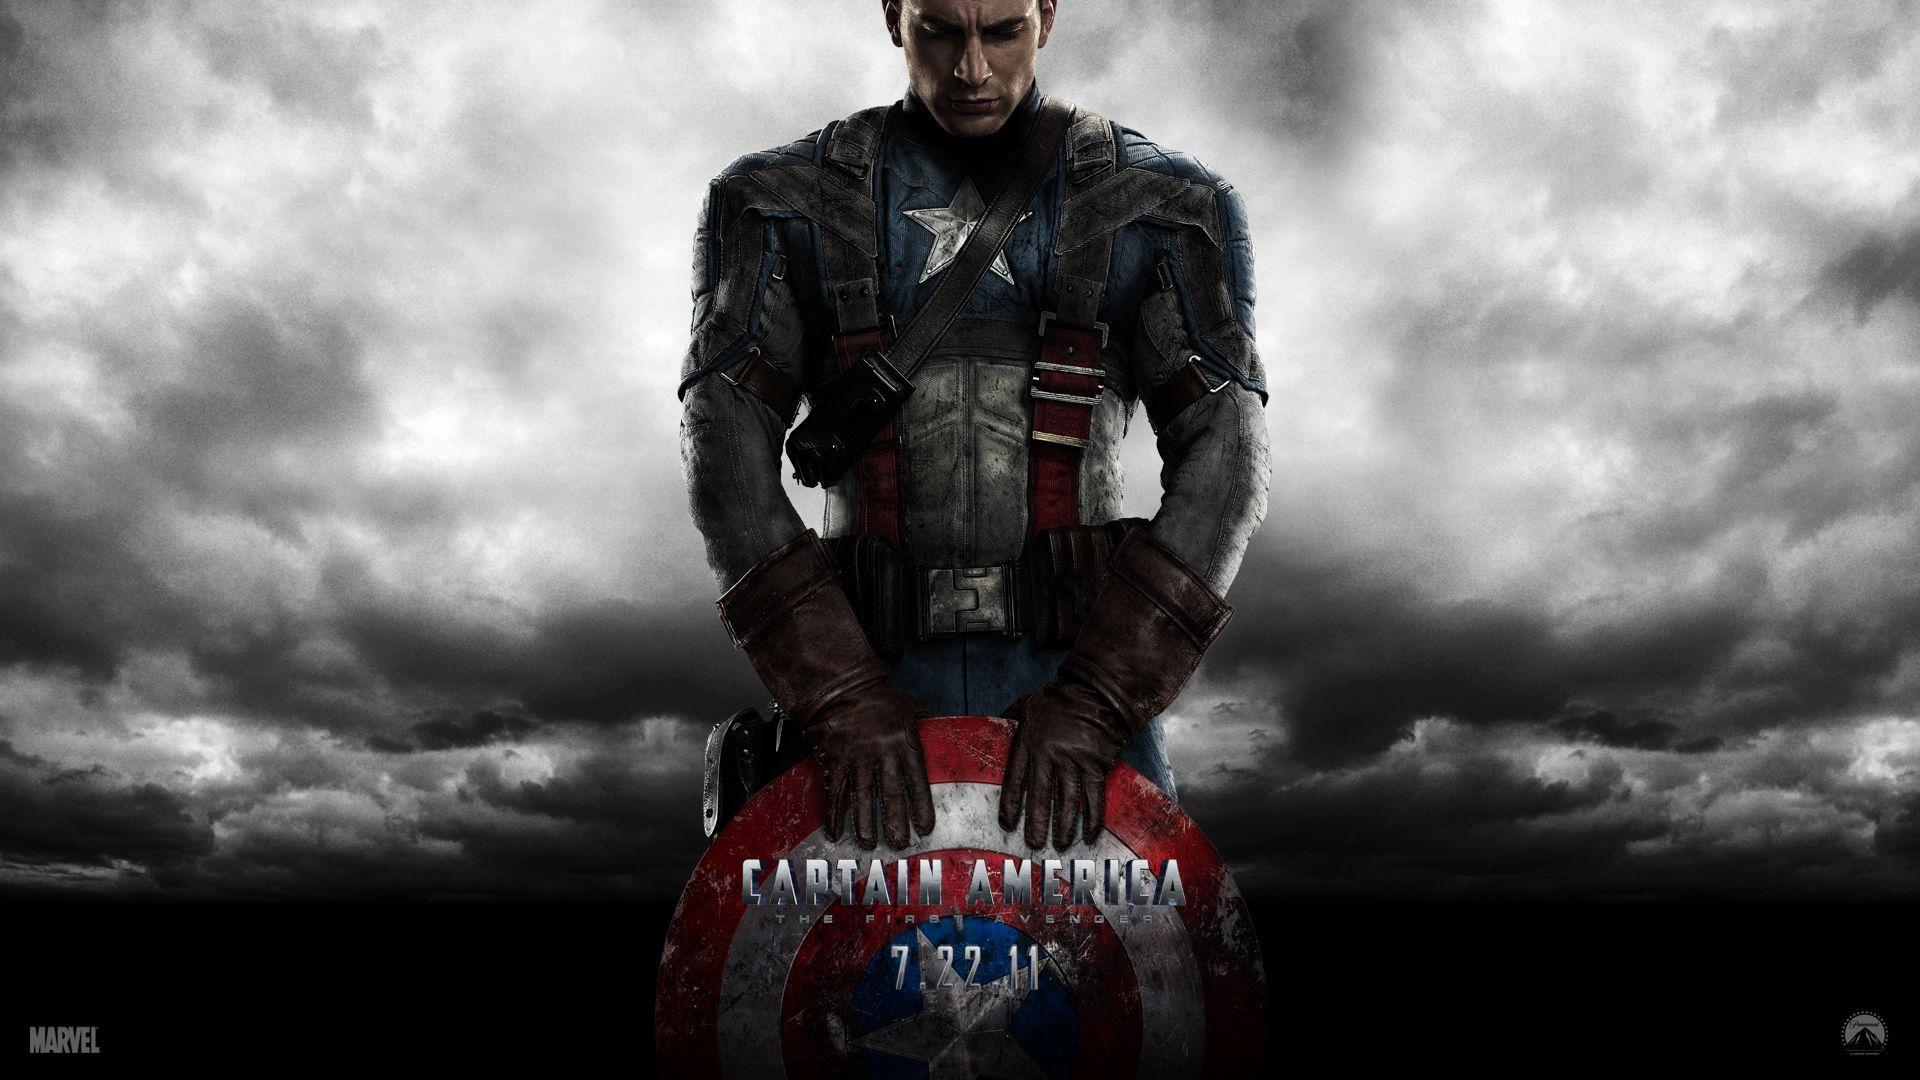 Captain America Chris Evans - wallpaper.